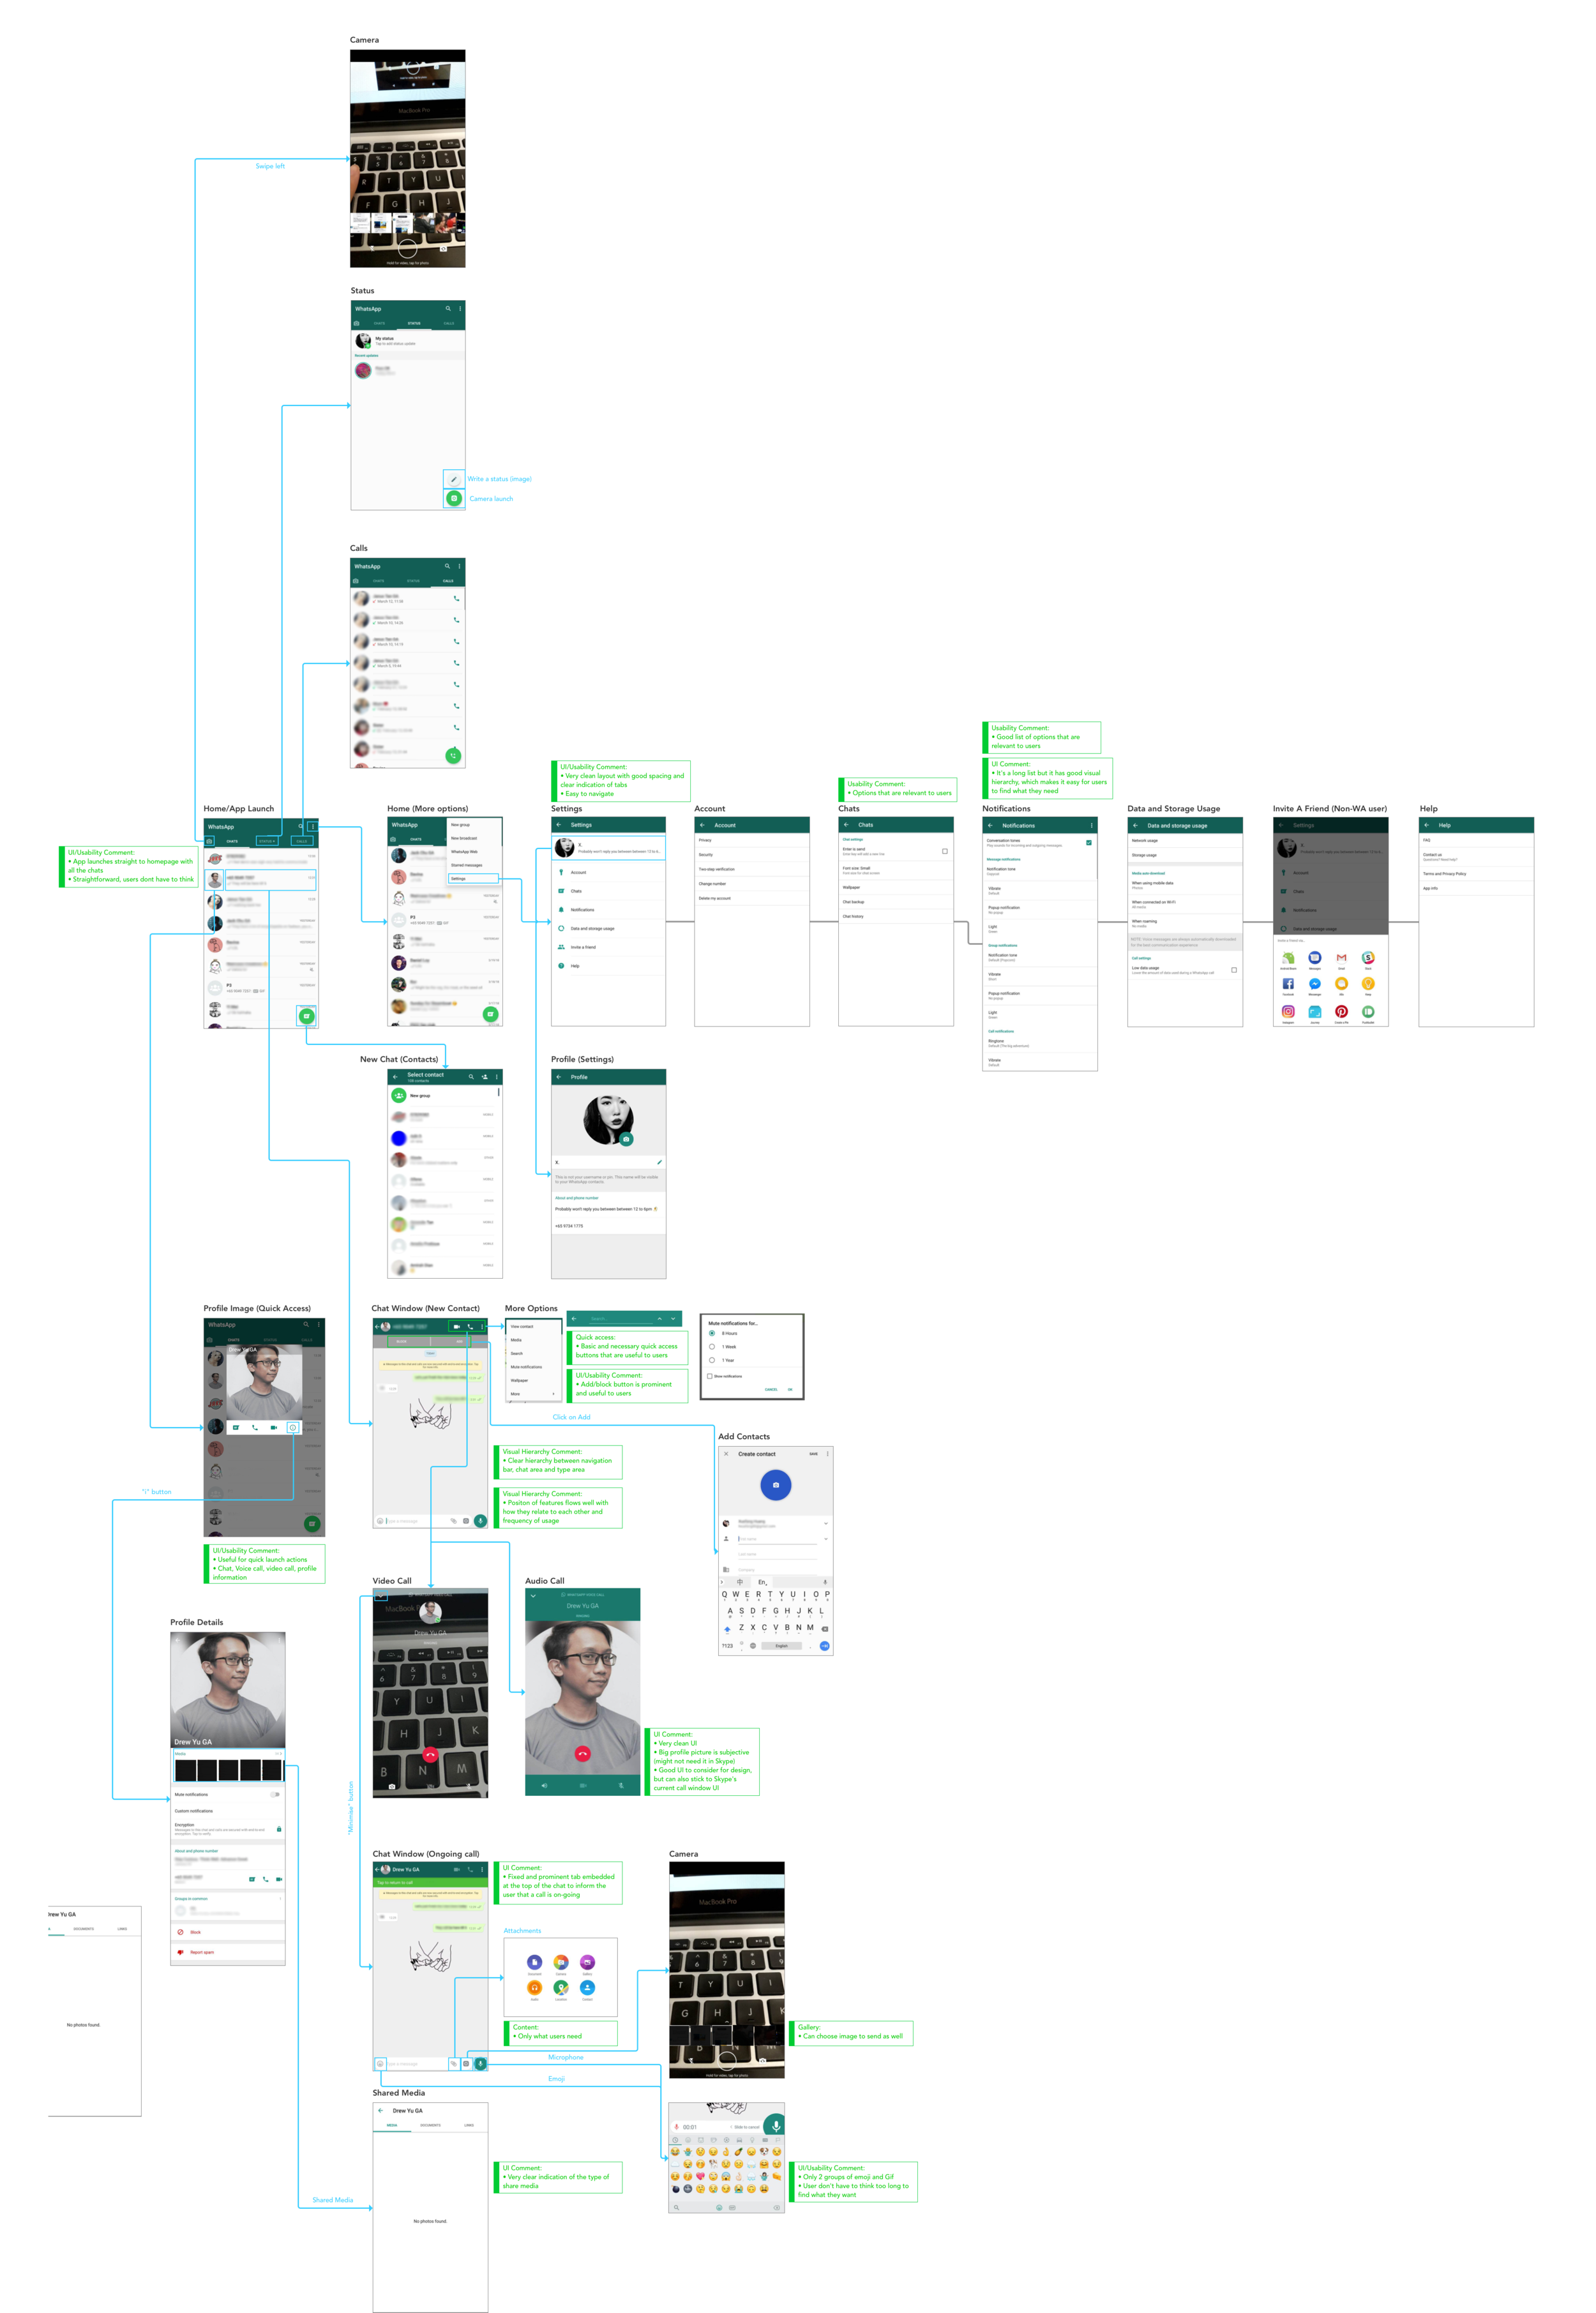 WhatsApp Screen Flow.png